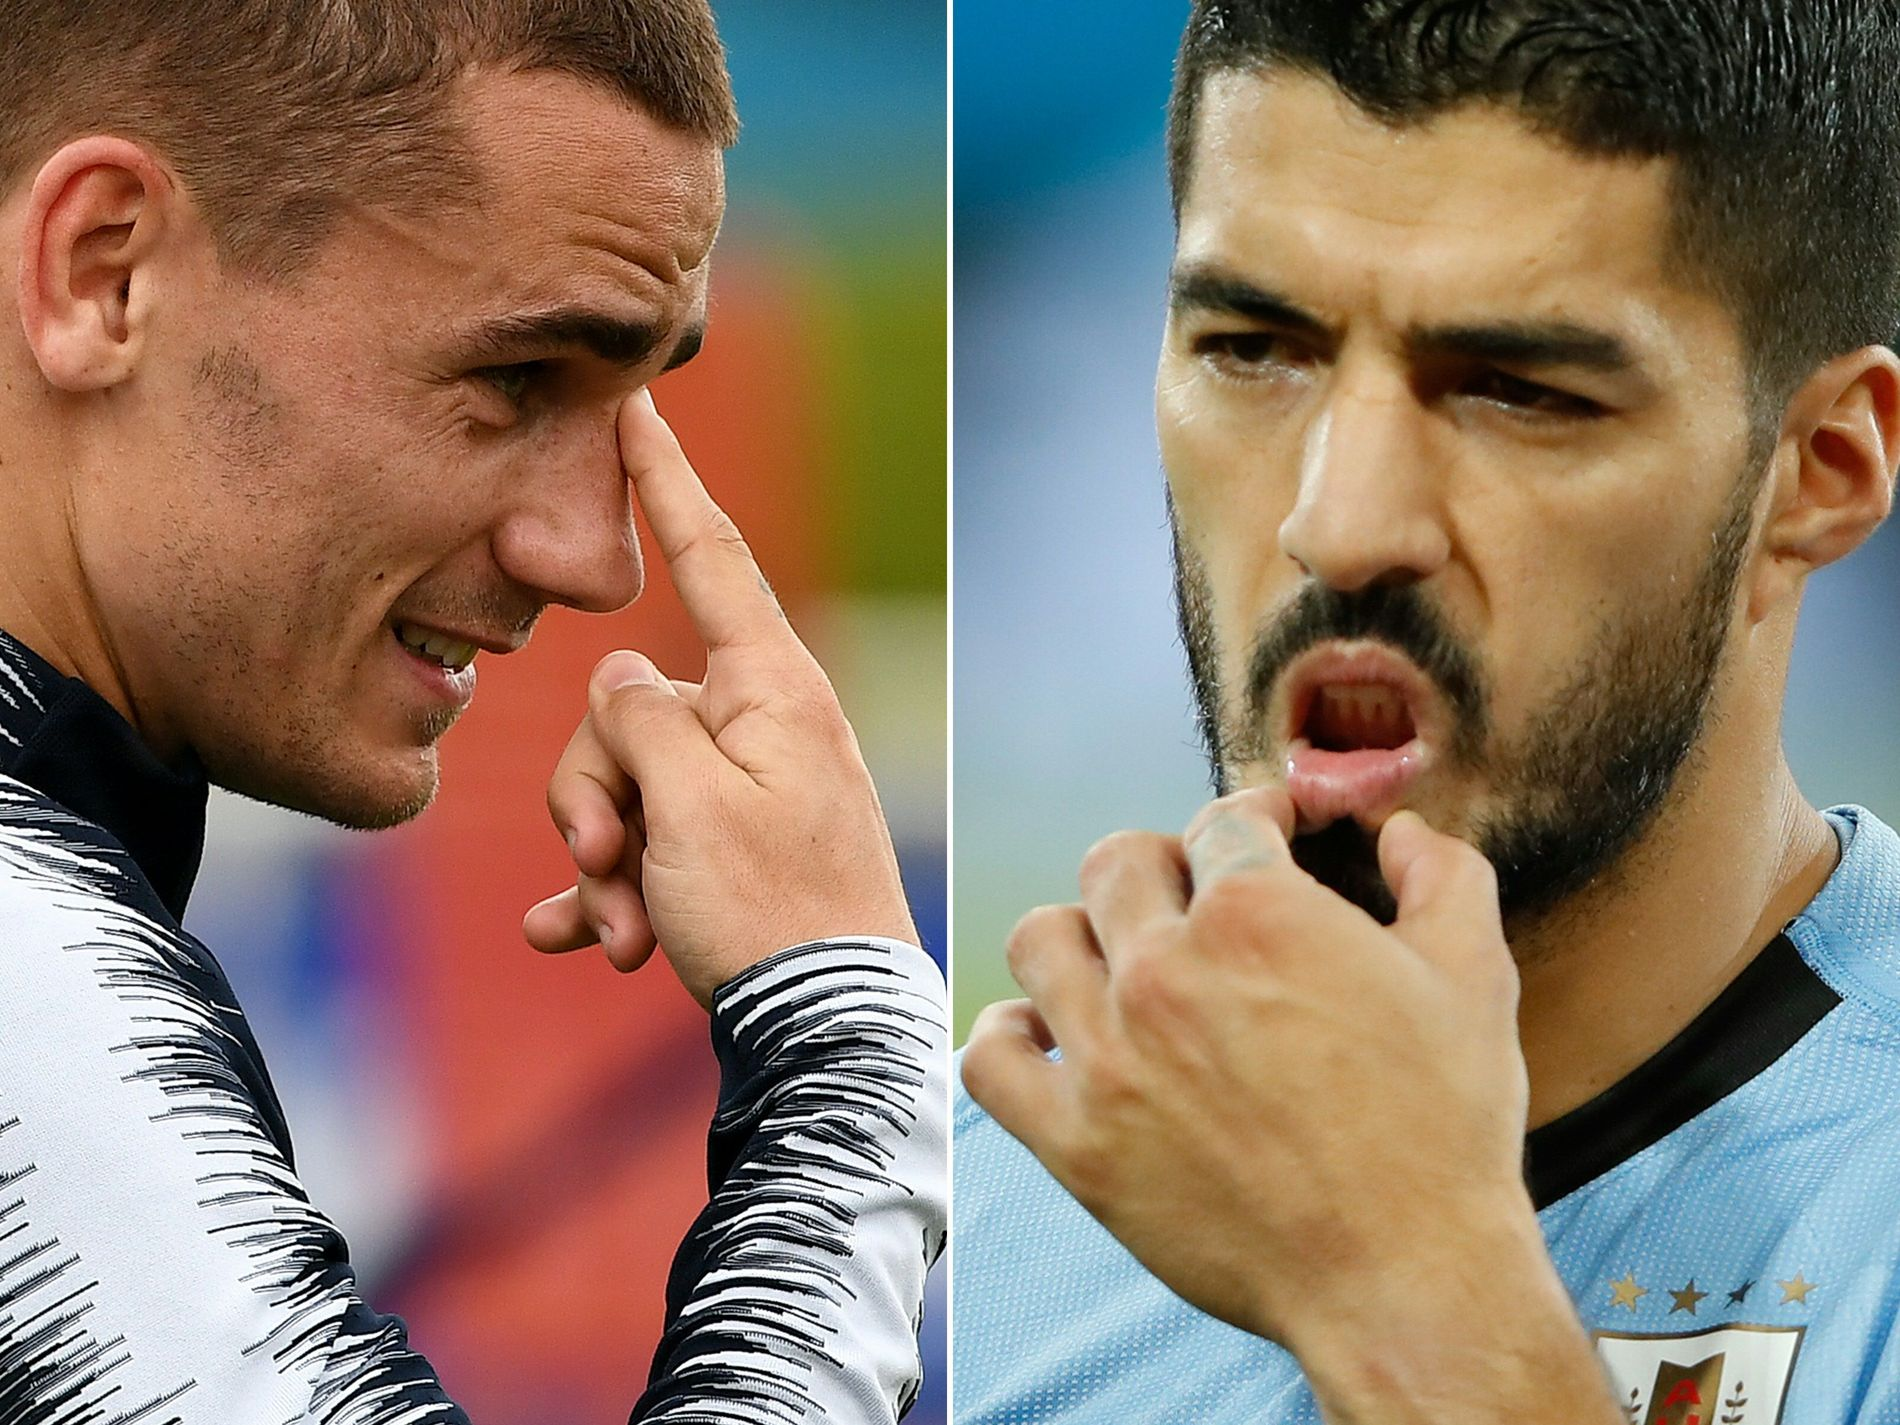 RIVALER: Antoine Griezmann (t.v.) og Luis Suárez er til daglig rivaler i Atlético Madrid og Barcelona. Fredag møtes de i VM for Frankrike og Uruguay.